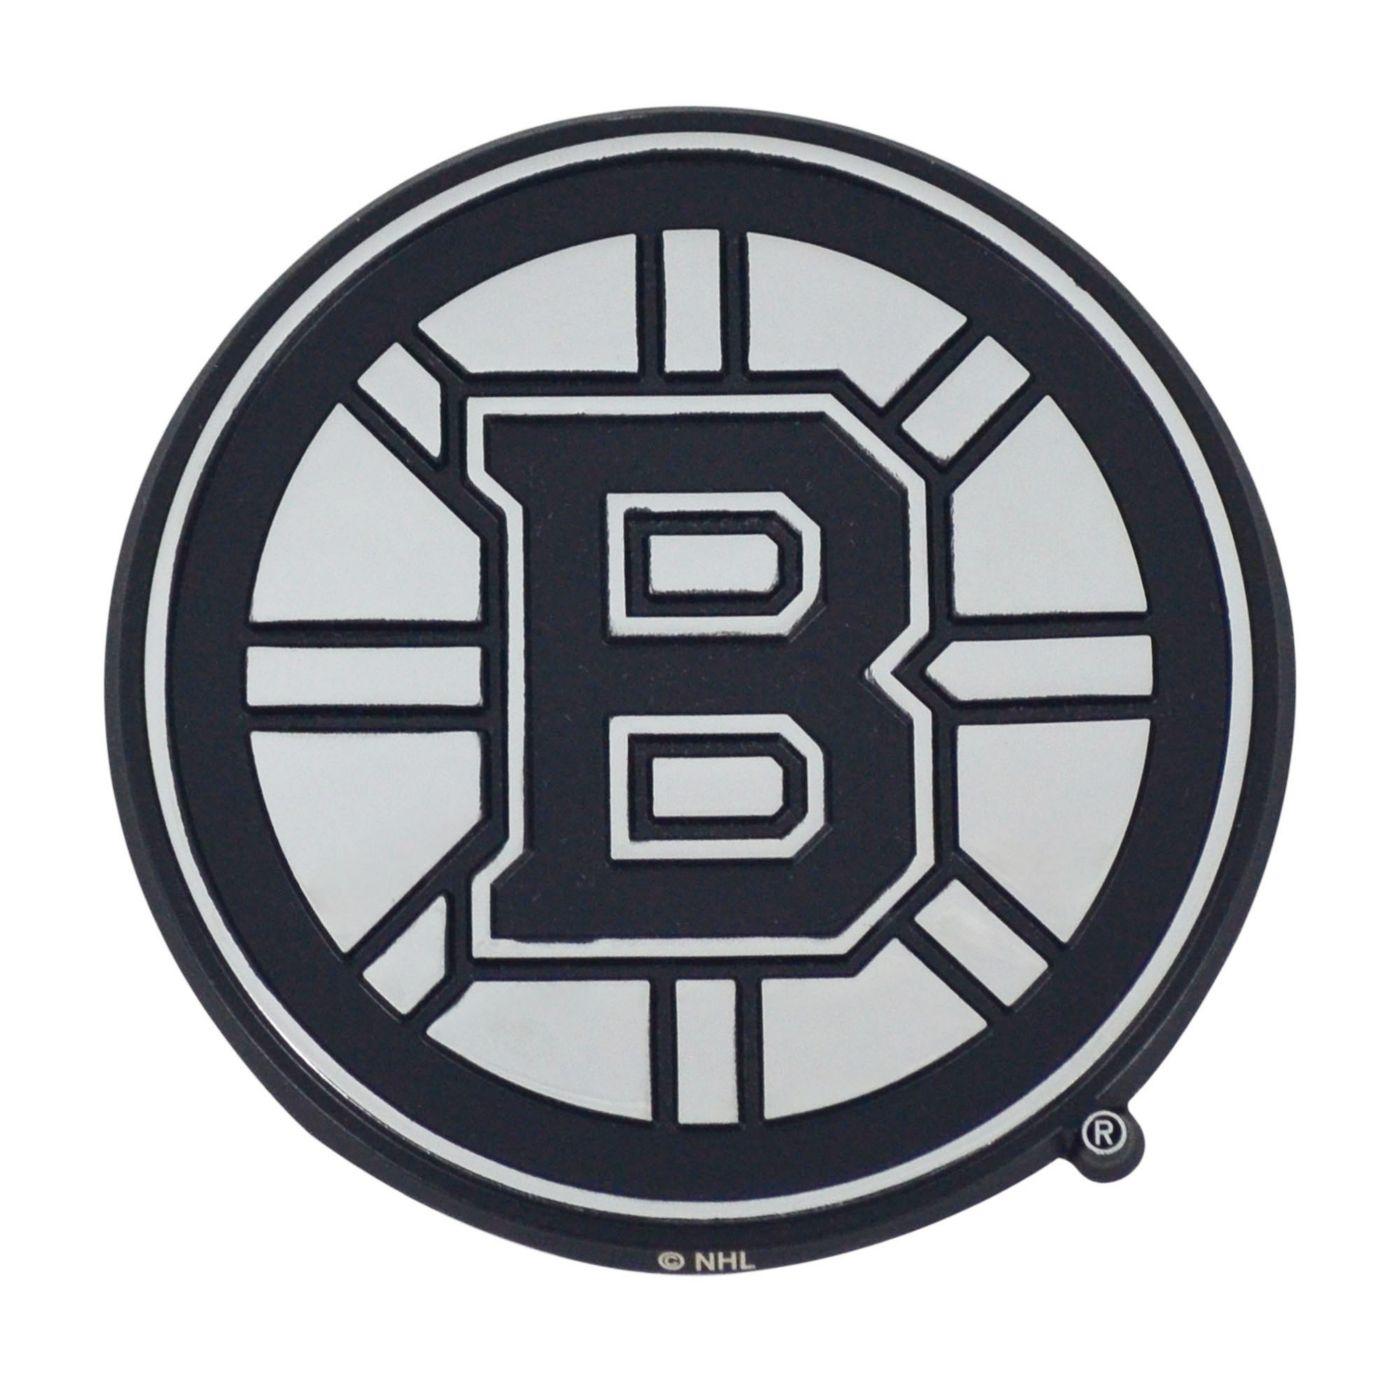 FANMATS Boston Bruins Chrome Emblem